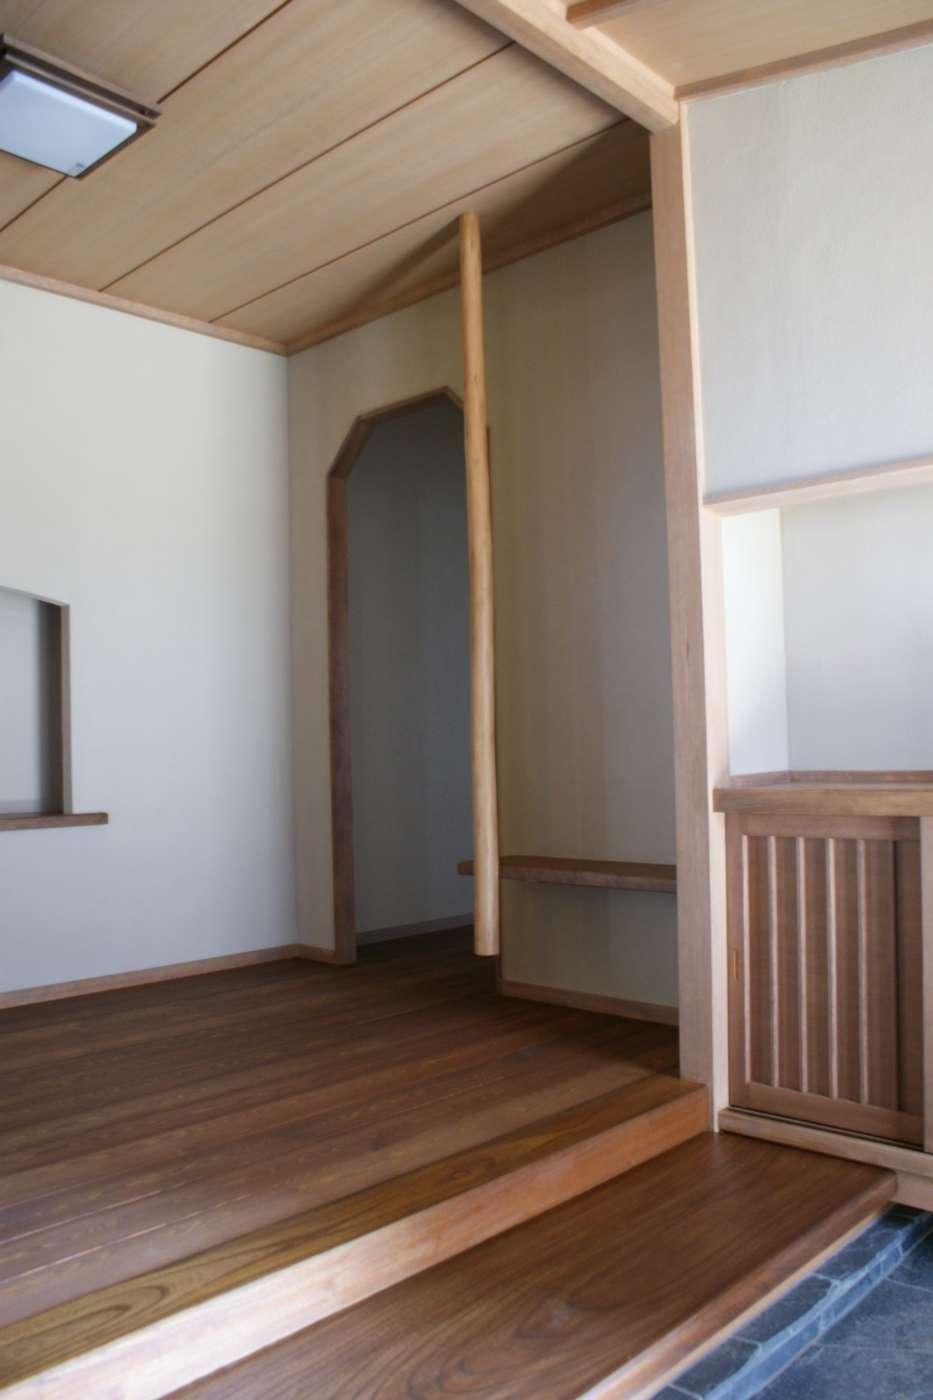 http://sumainomatsuki.com/folder1/DSC01930.JPG